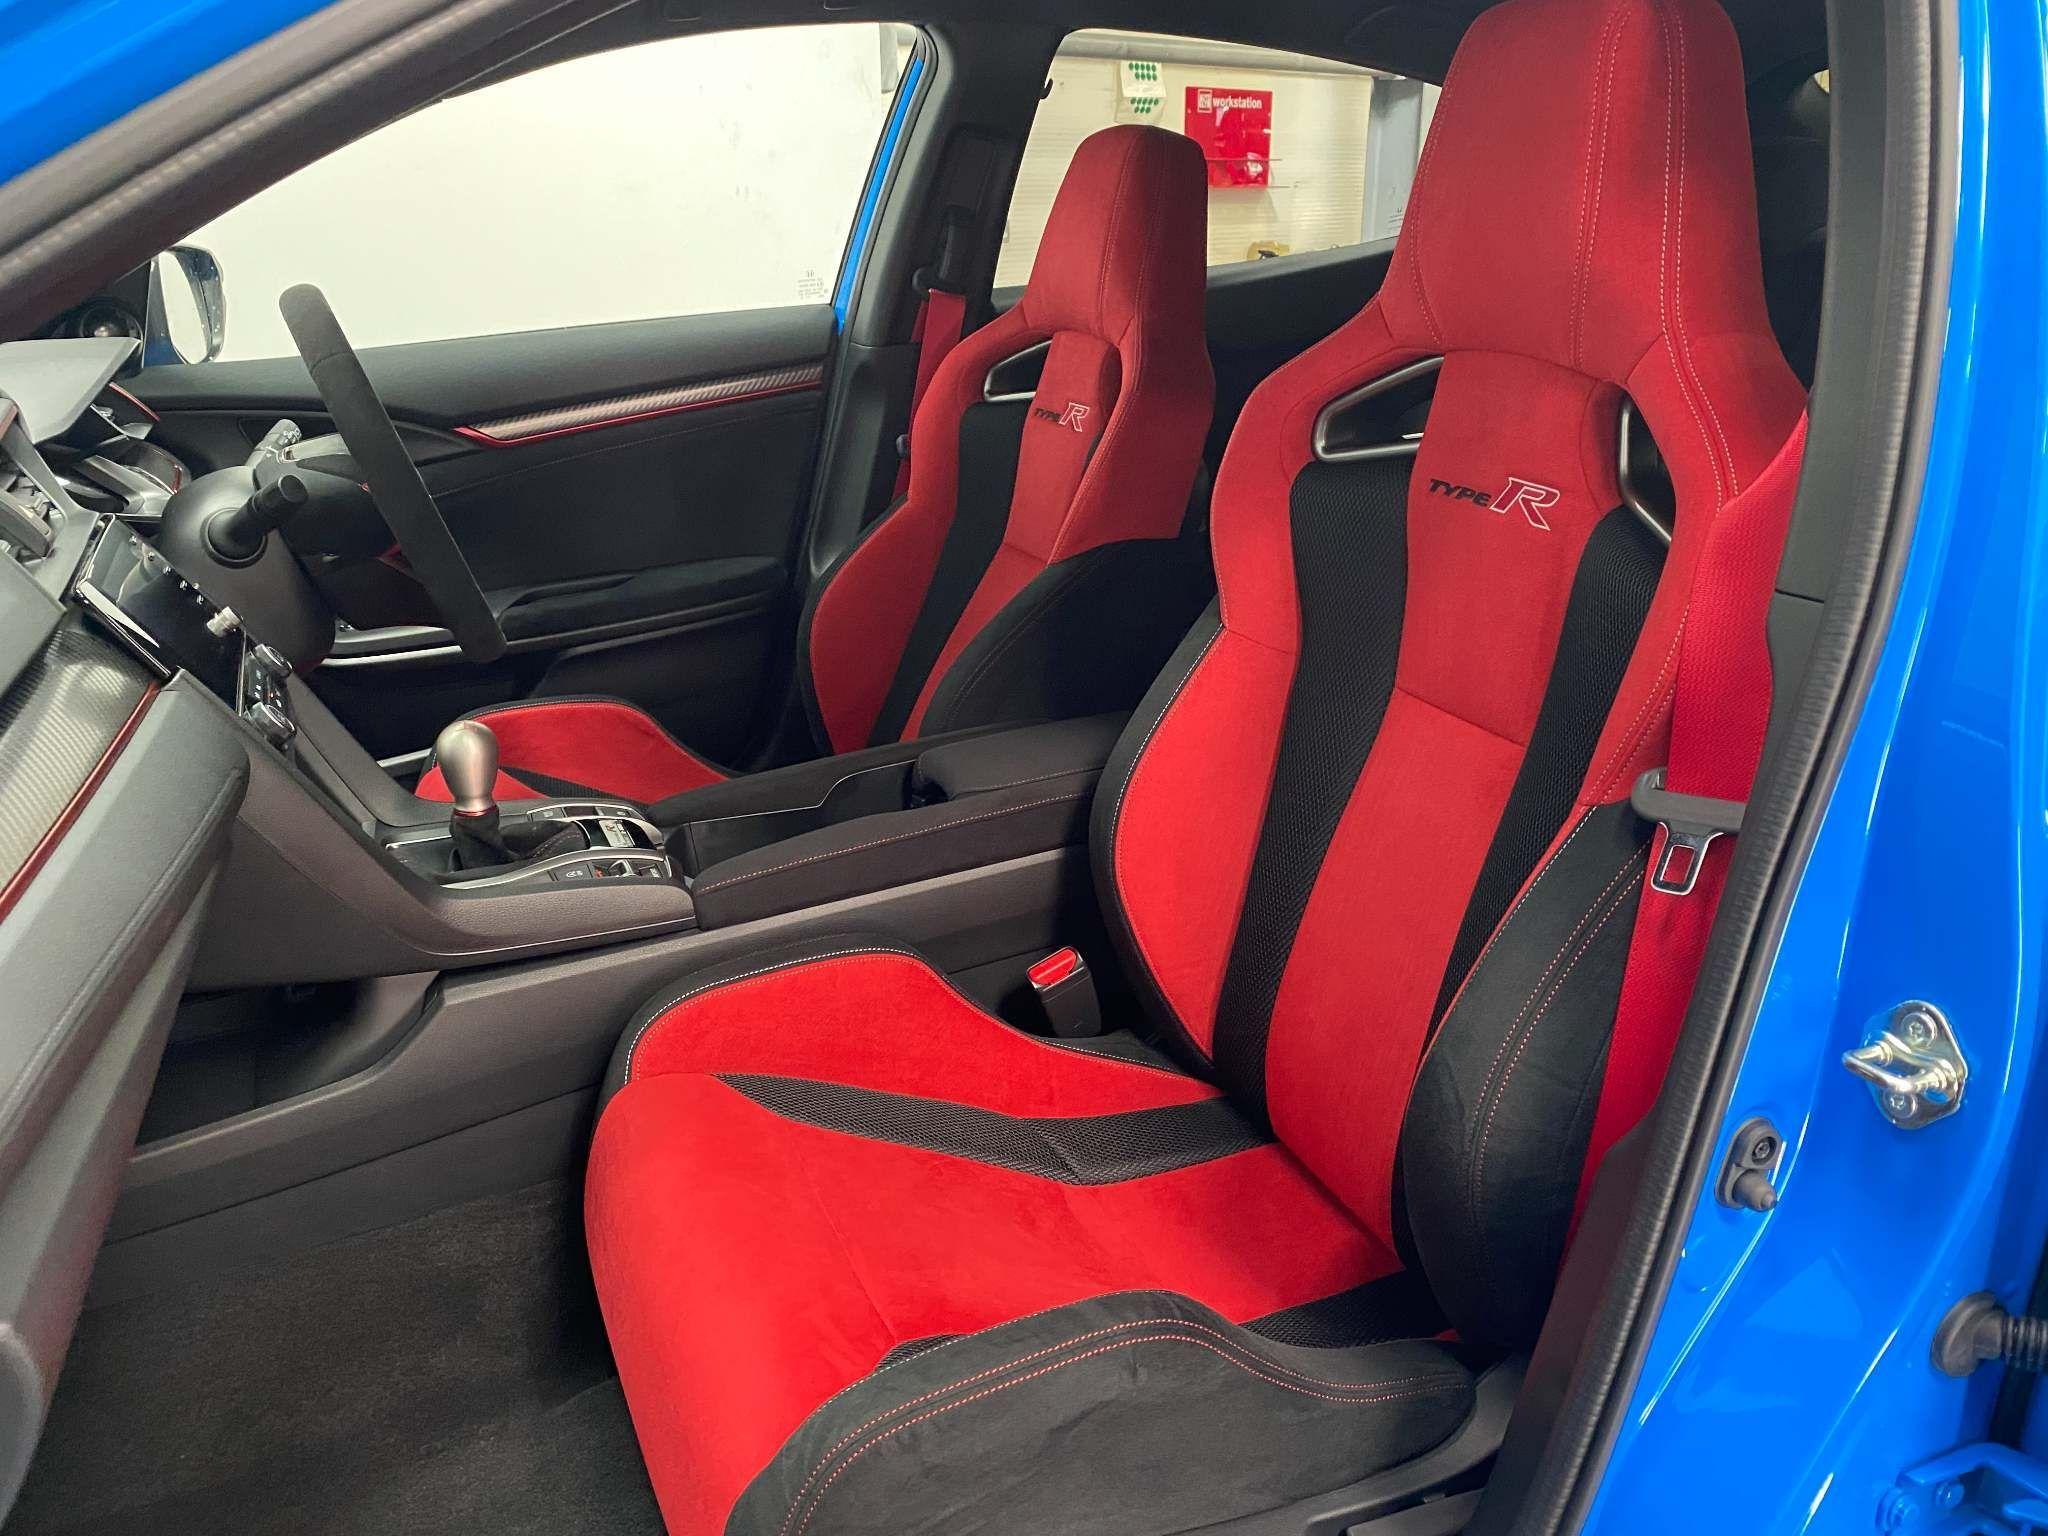 Honda Civic Type R Images